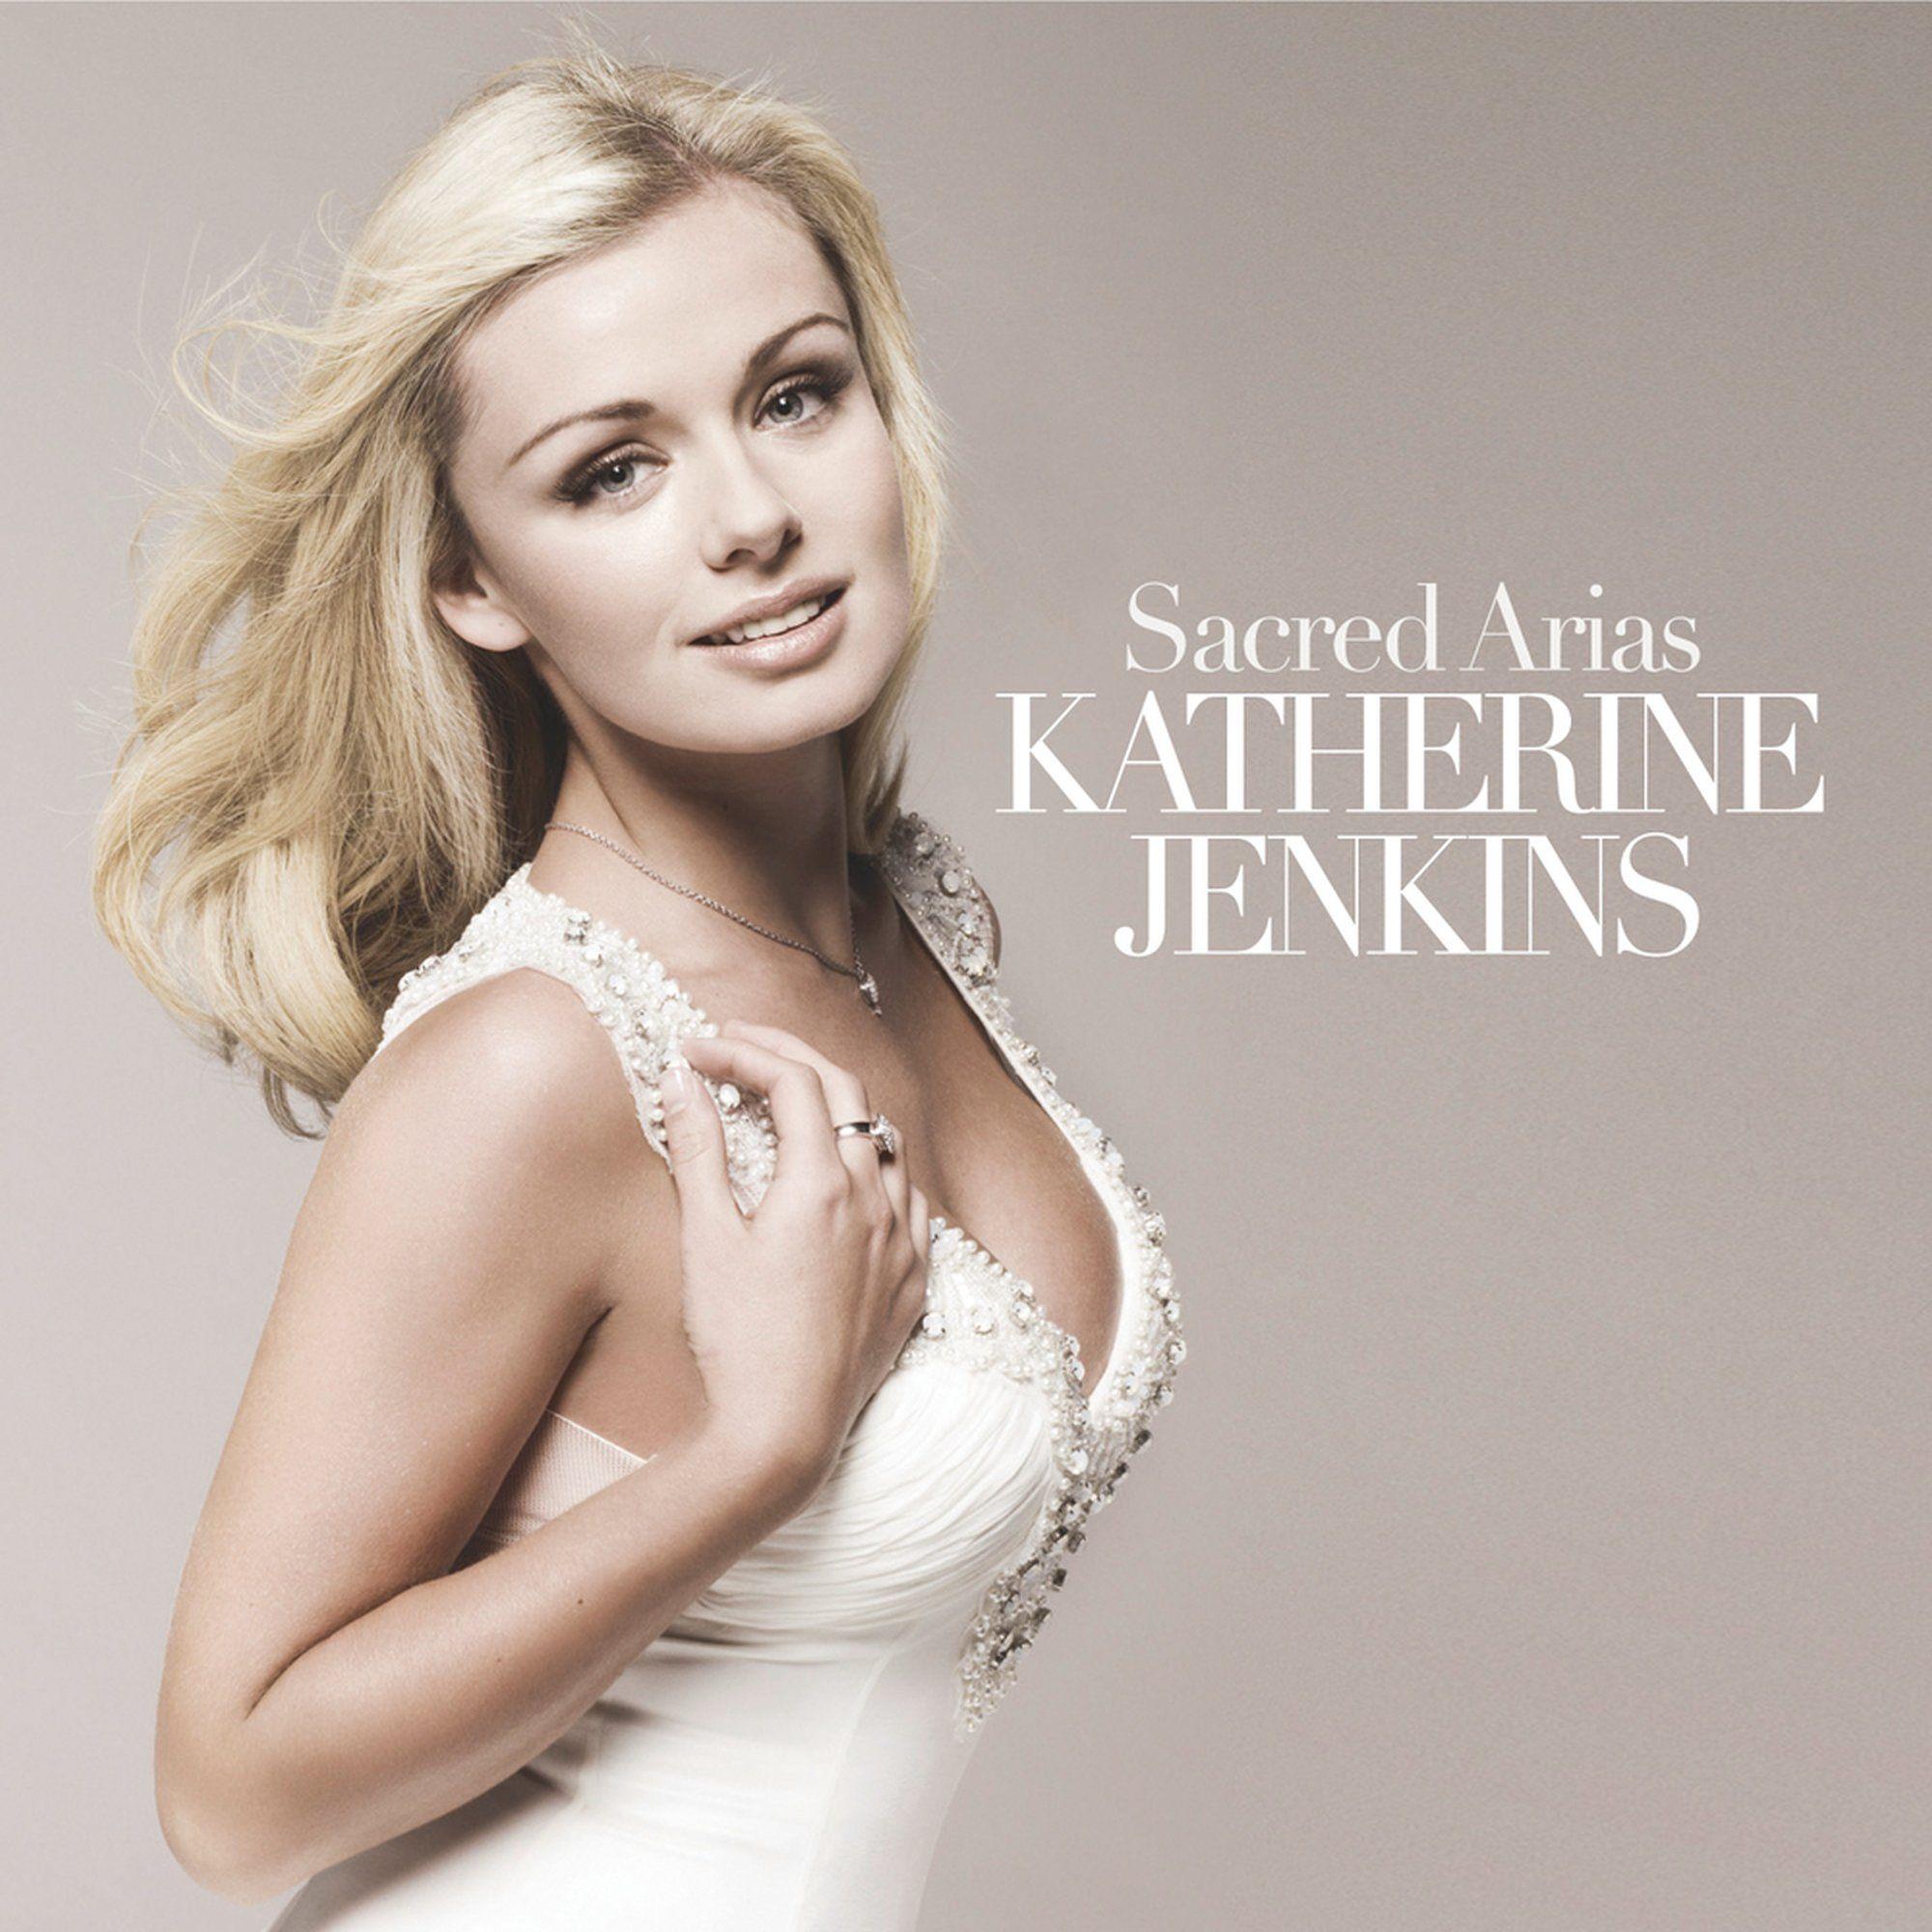 Katherine Jenkins - Sacred Arias album cover